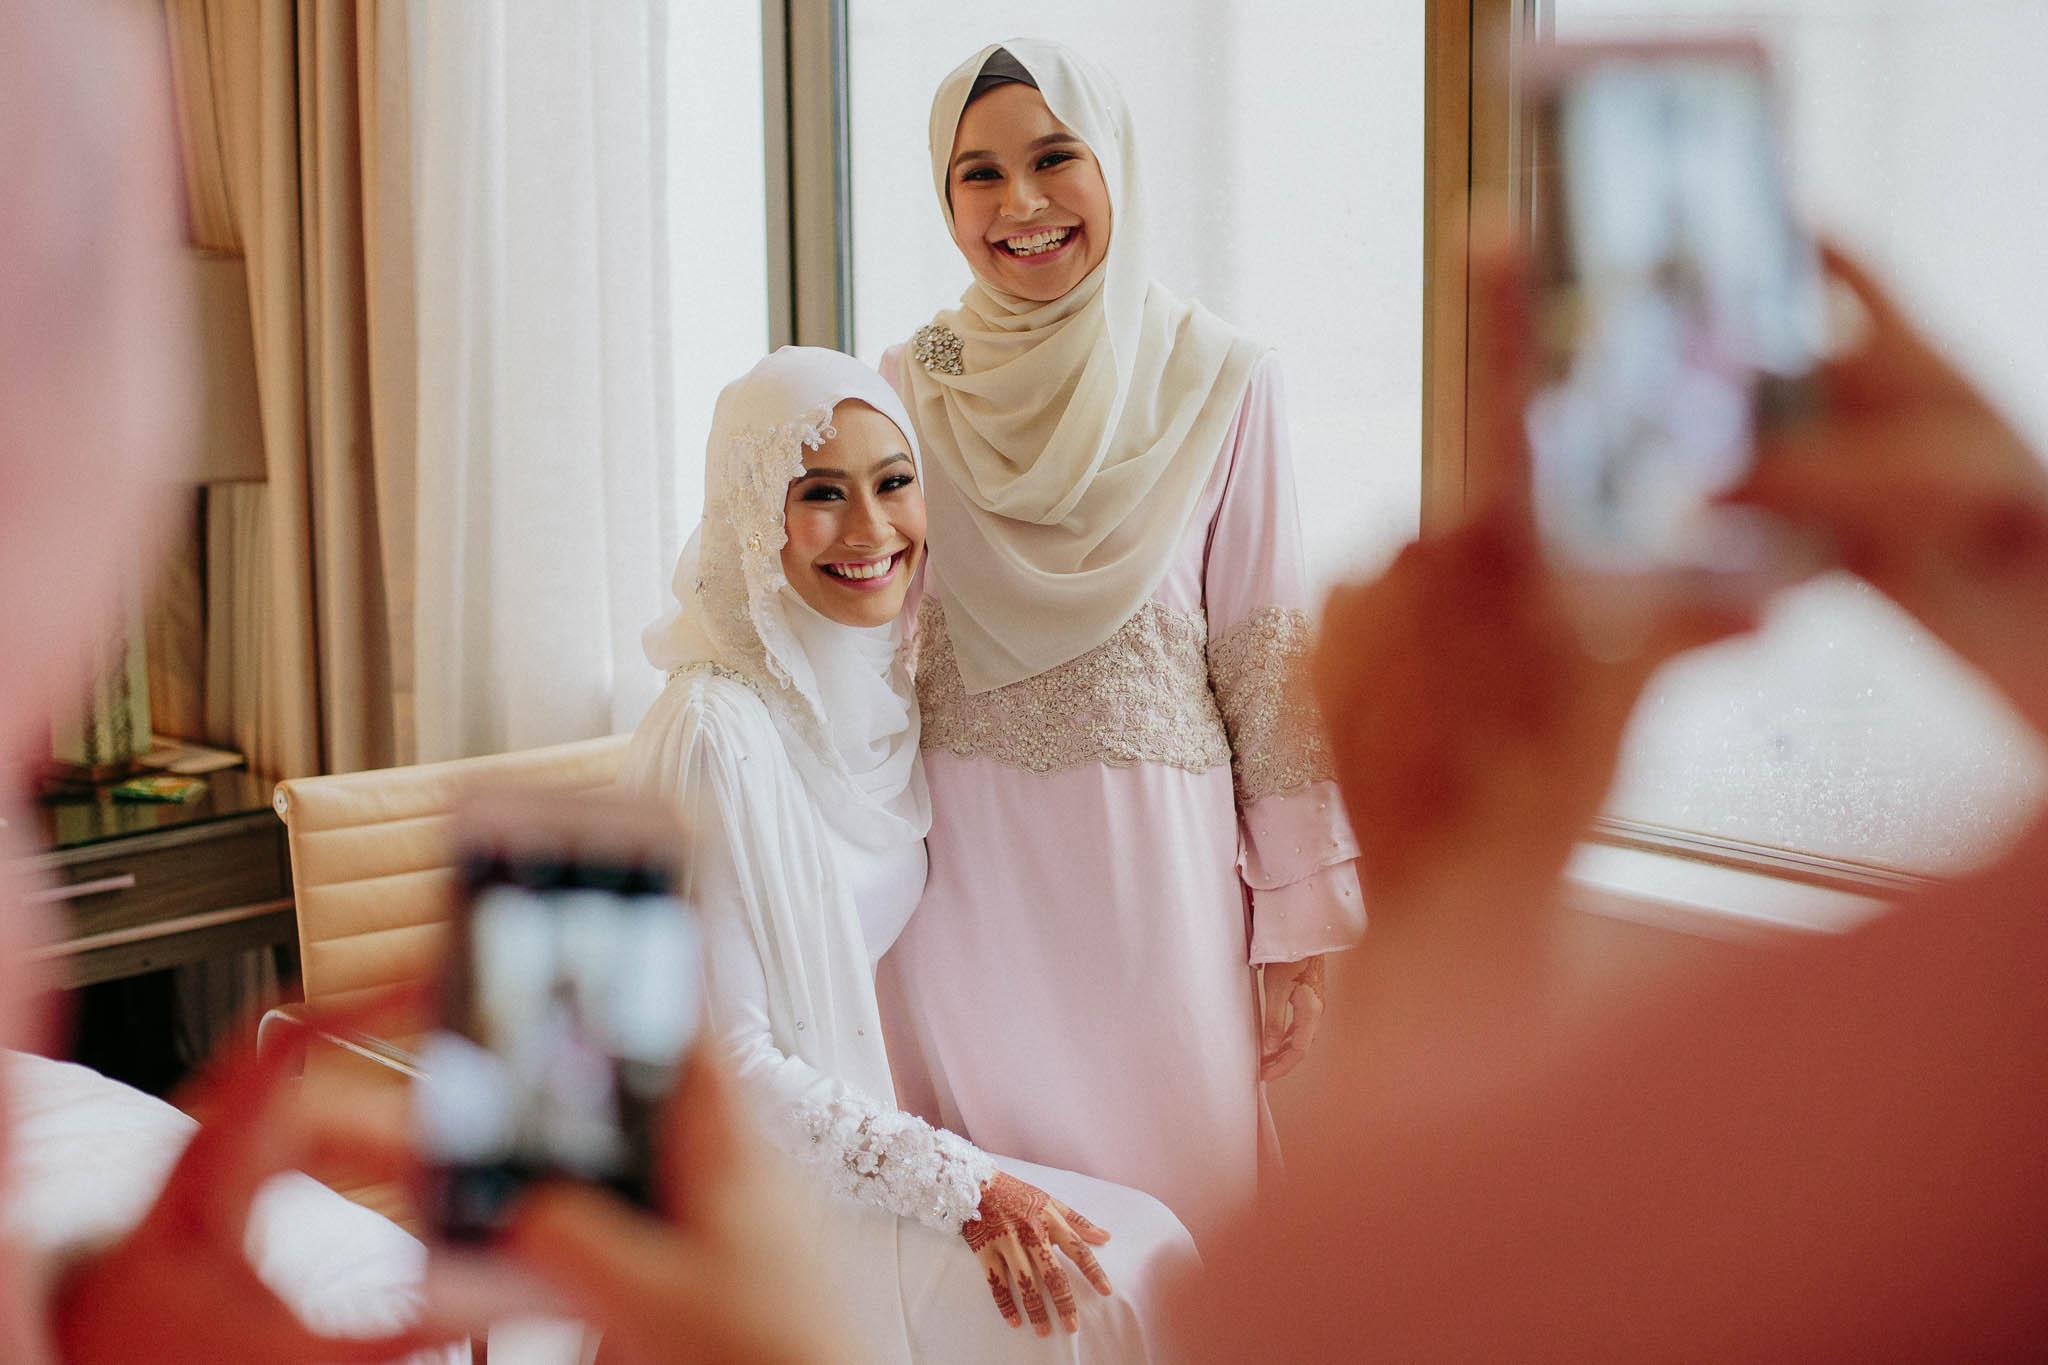 singapore-wedding-photographer-sarah-razif-11.jpg